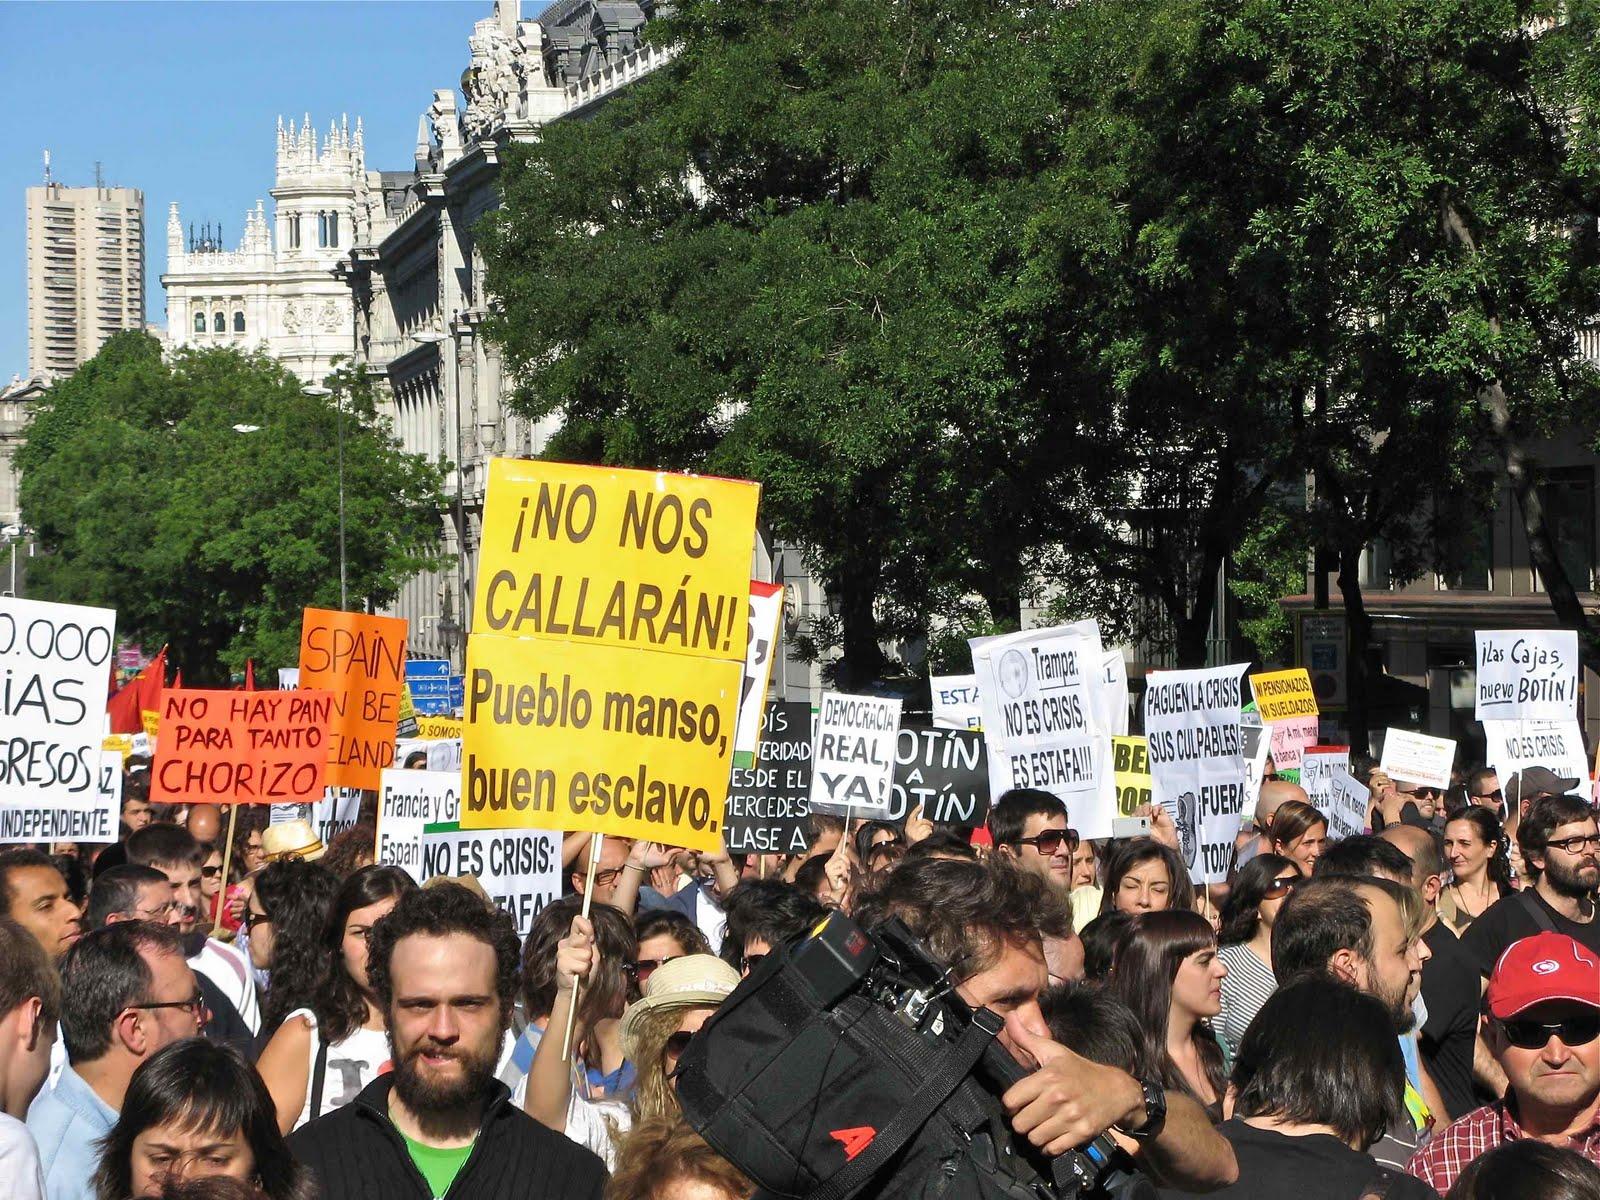 Murcia en lucha mayo 2011 for Habitamos madrid